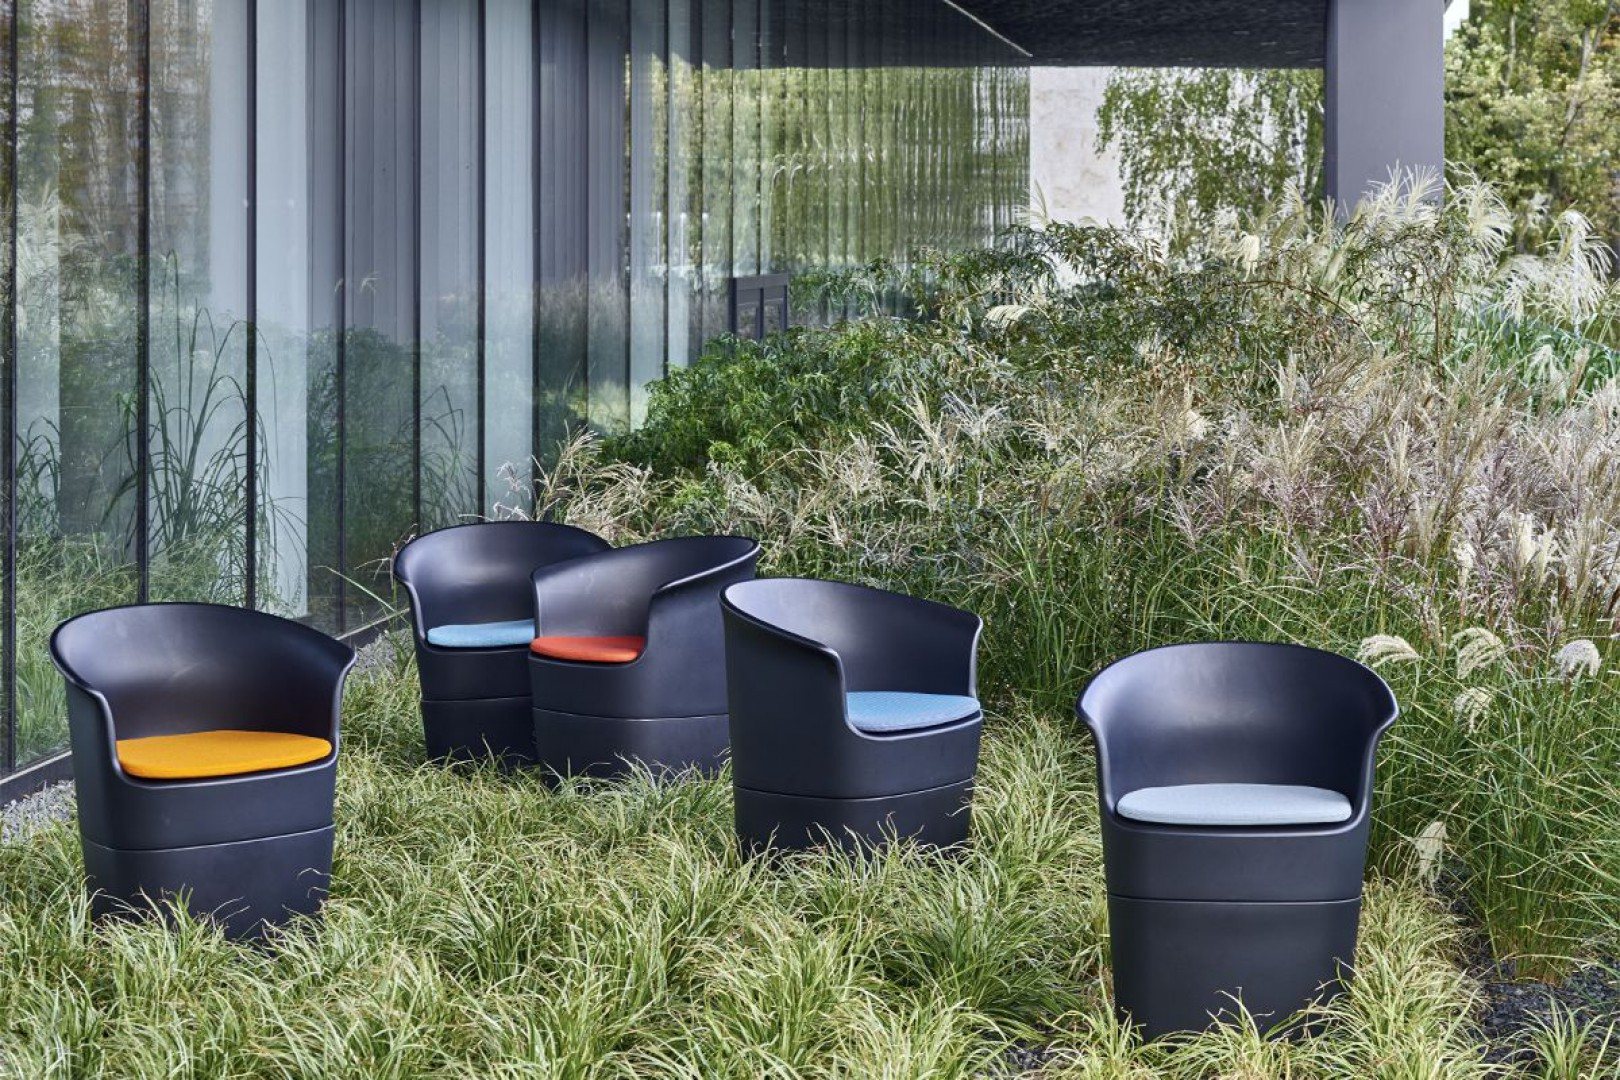 Fotele z kolekcji Tulli firmy Noti. Projekt: Tomek Rygalik. Fot. Noti